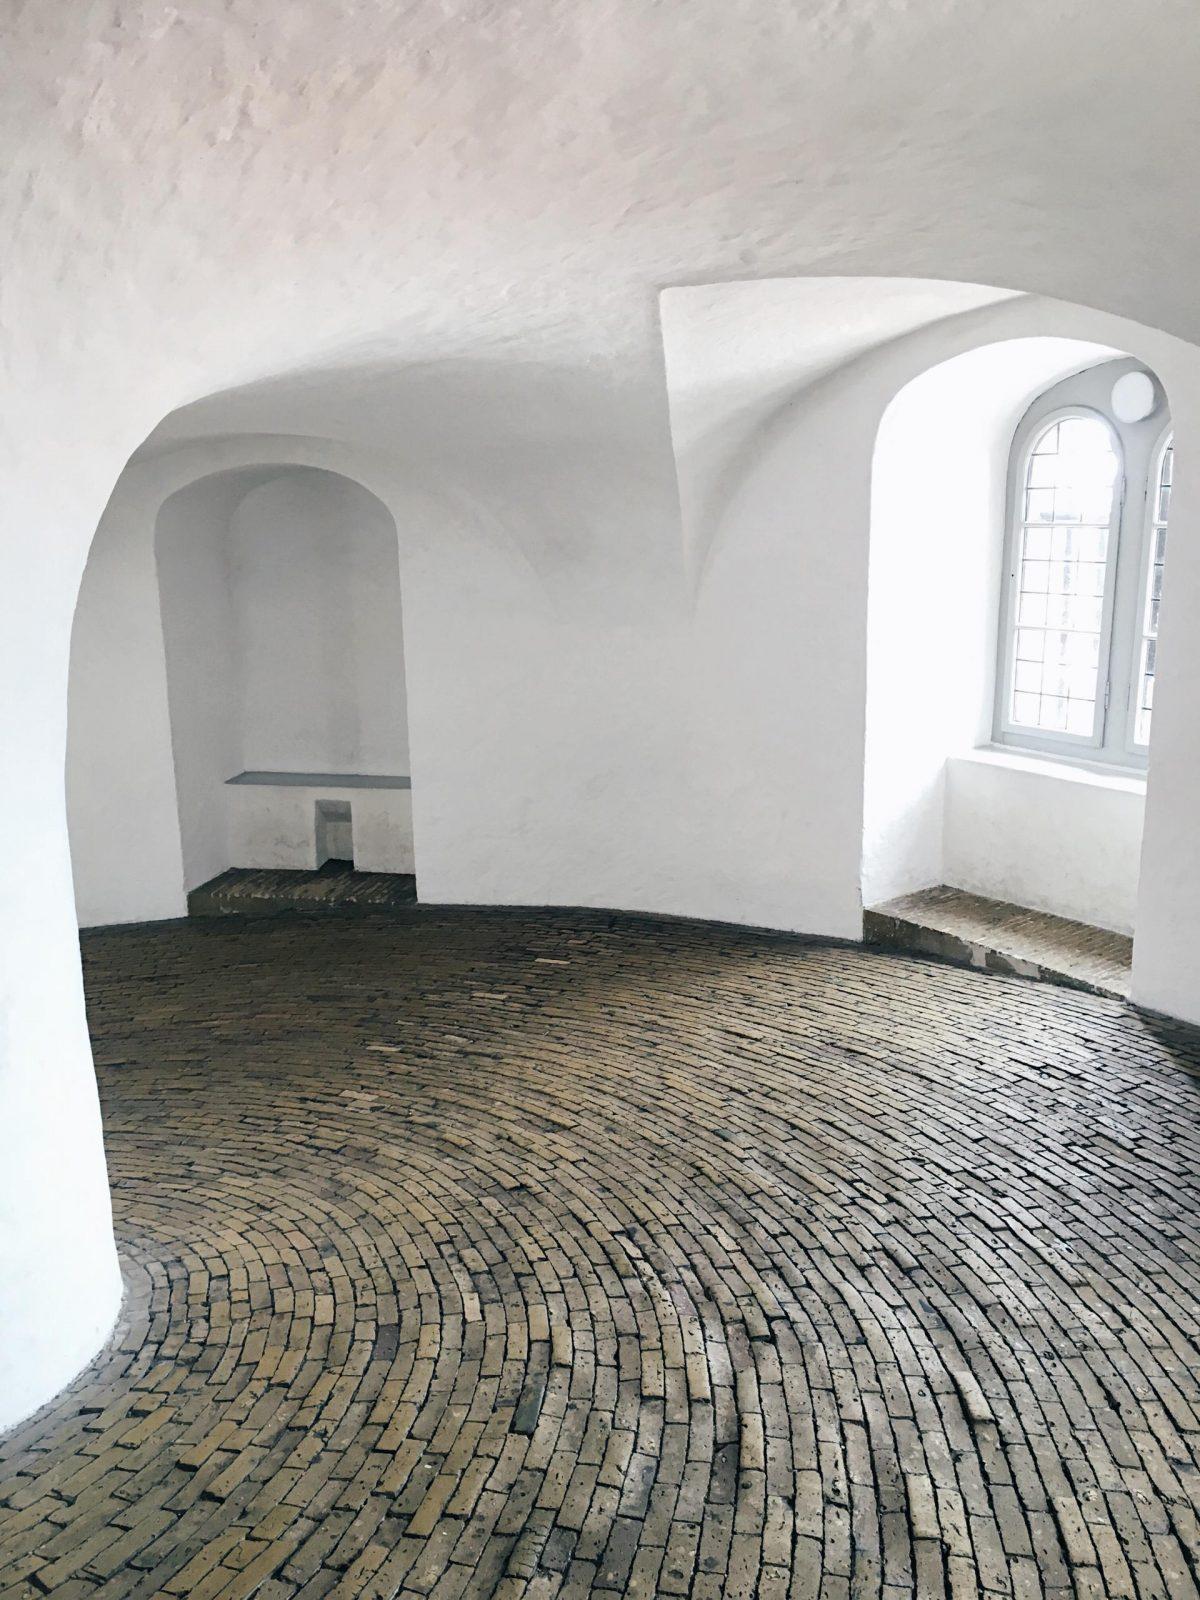 Familienausflug Kopenhagen Runder Turm | Pinspiration